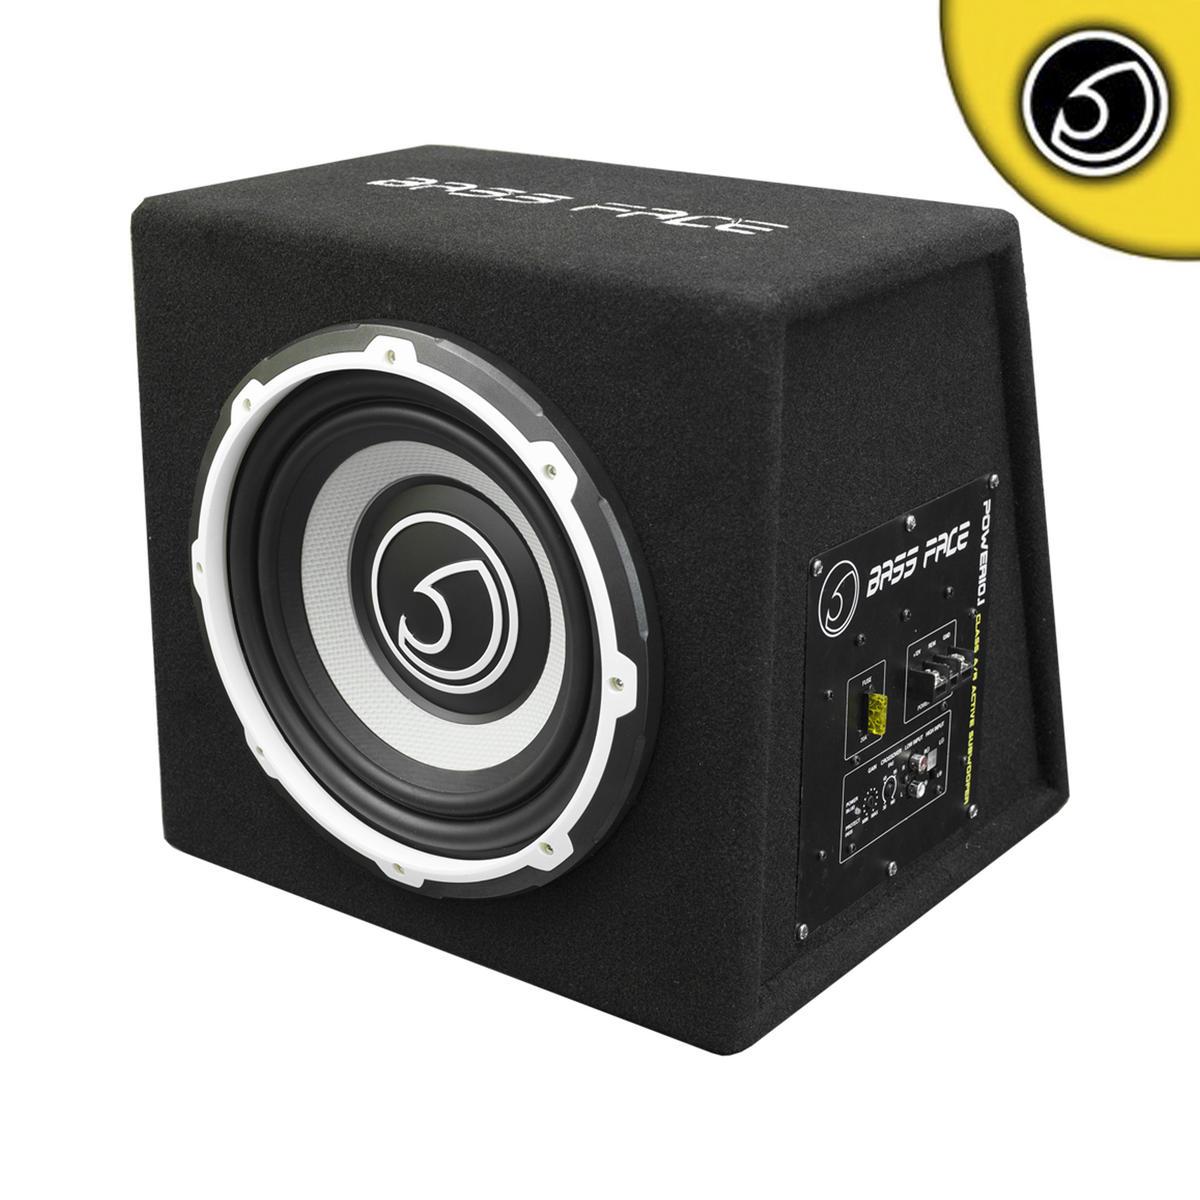 "Bassface POWER10.1 1000w 10"" Inch Active Car Sub Amp Amplifier Powered Bass Box"